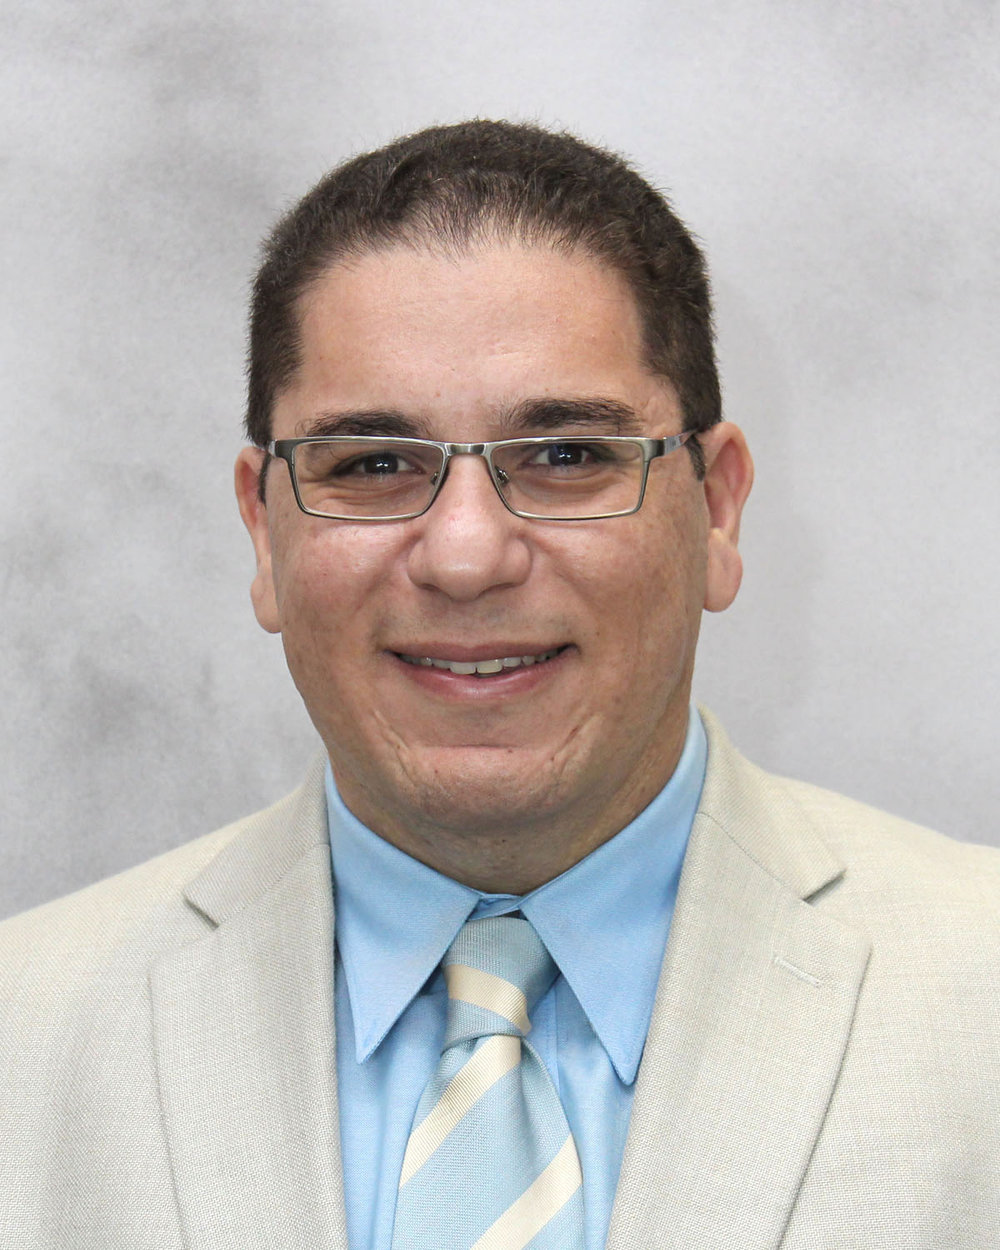 Dr. Alaa Elwany